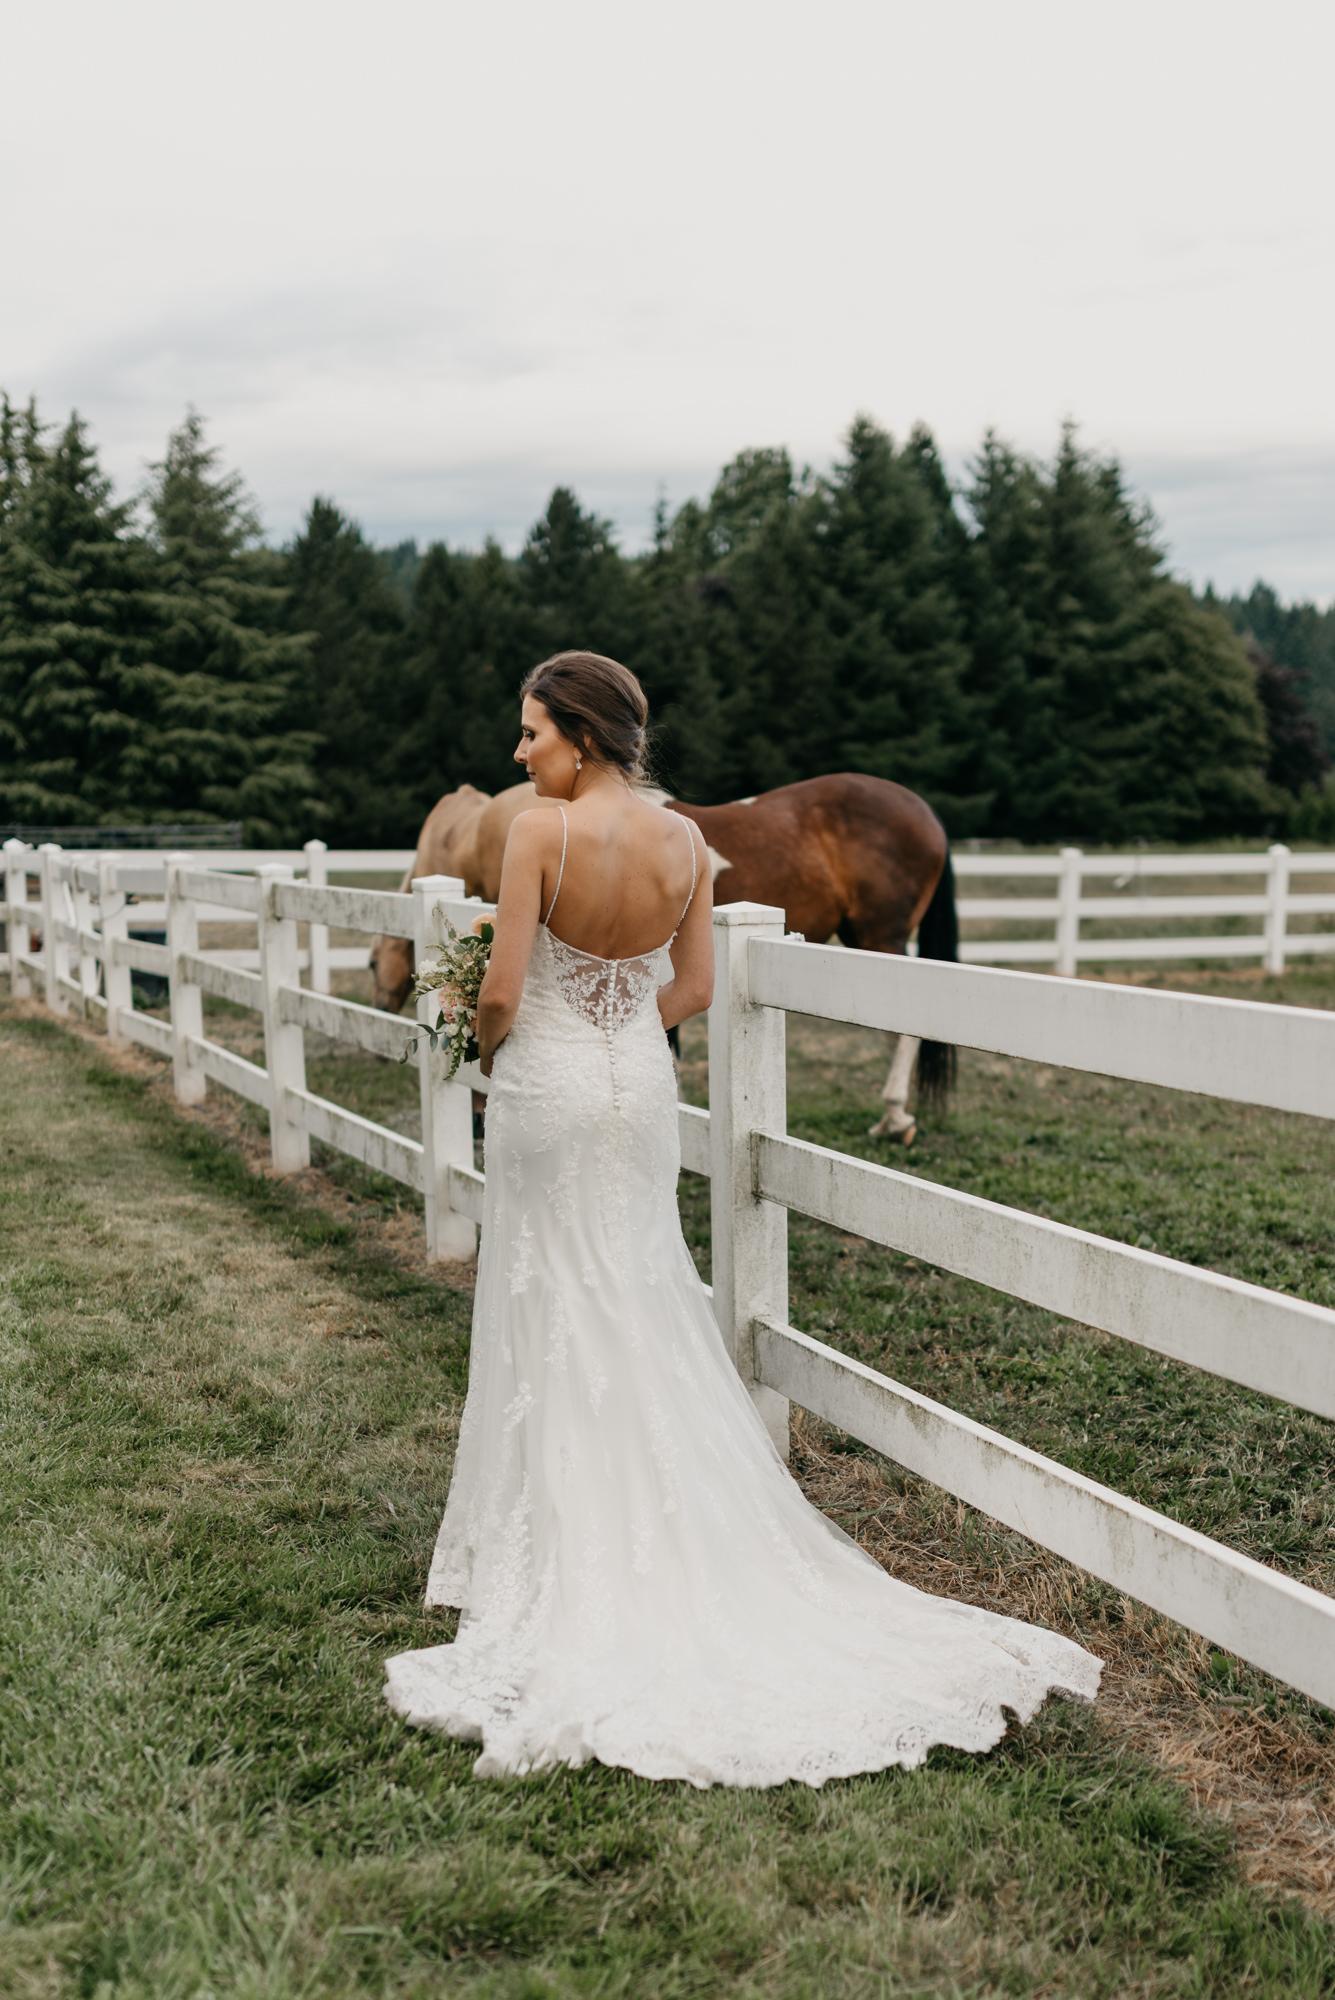 187-barn-kestrel-portland-northwest-horse-sunset-wedding.jpg